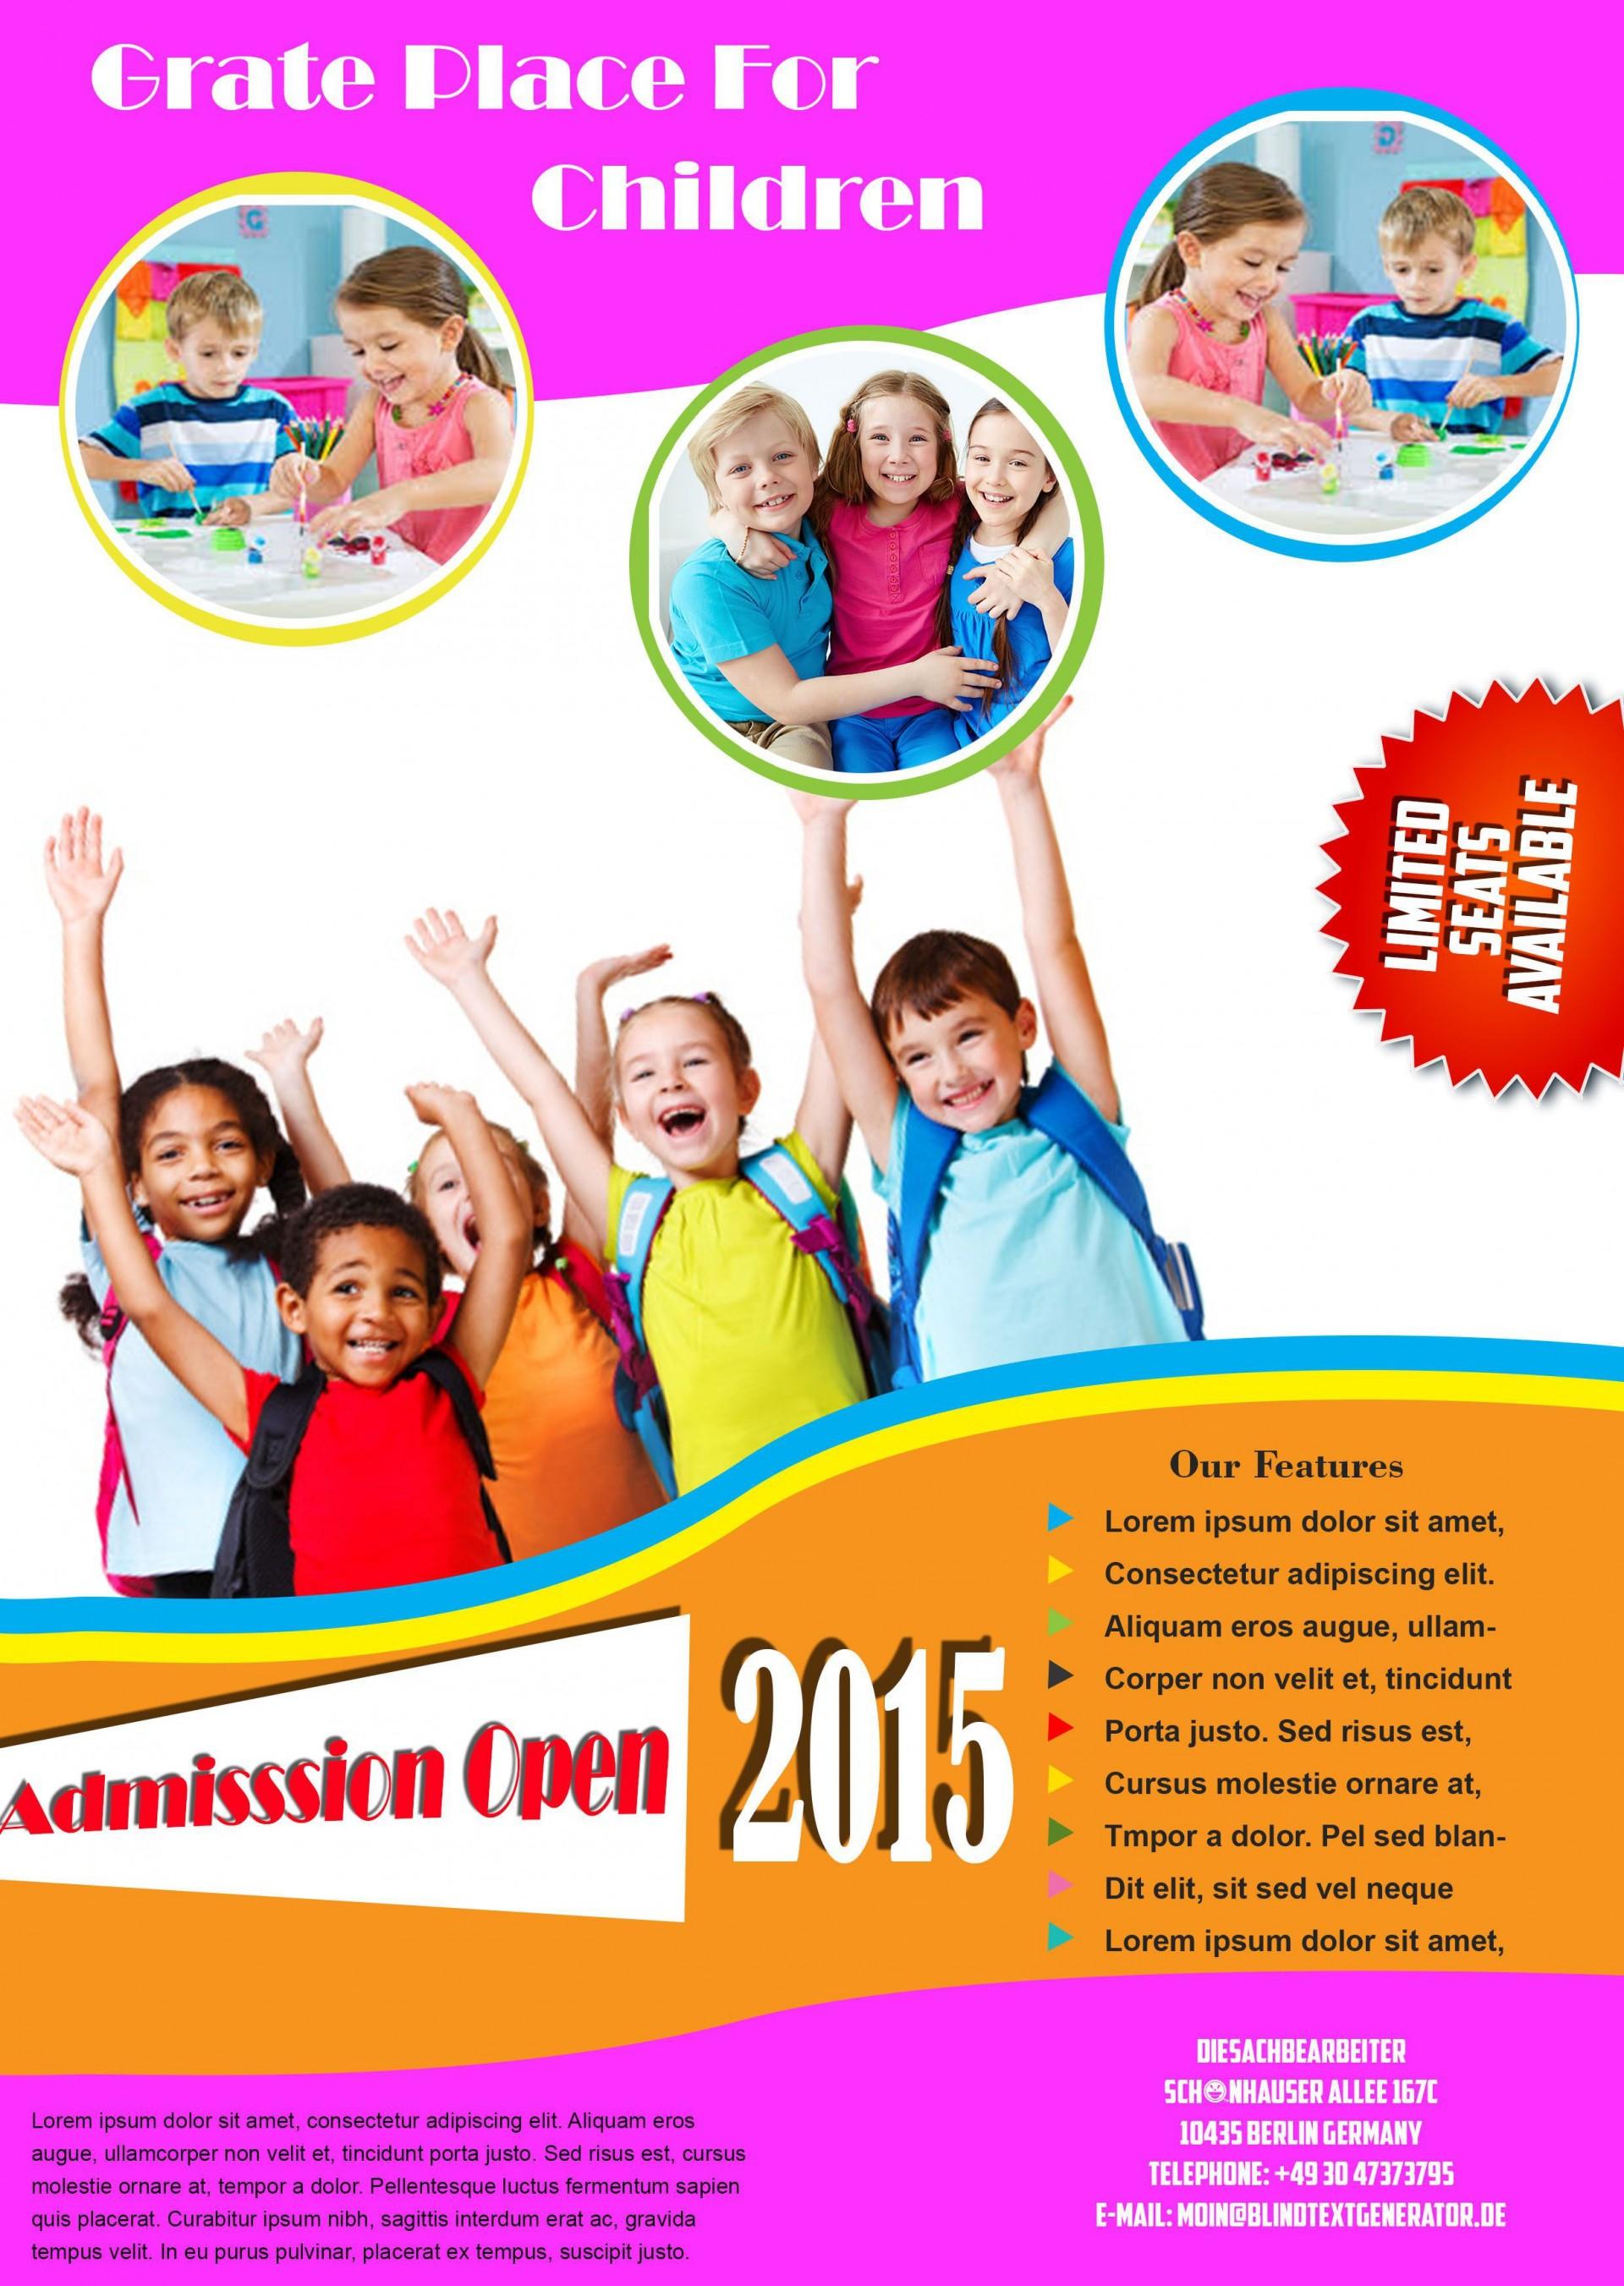 009 Sensational Free School Event Flyer Template Picture  Templates1920